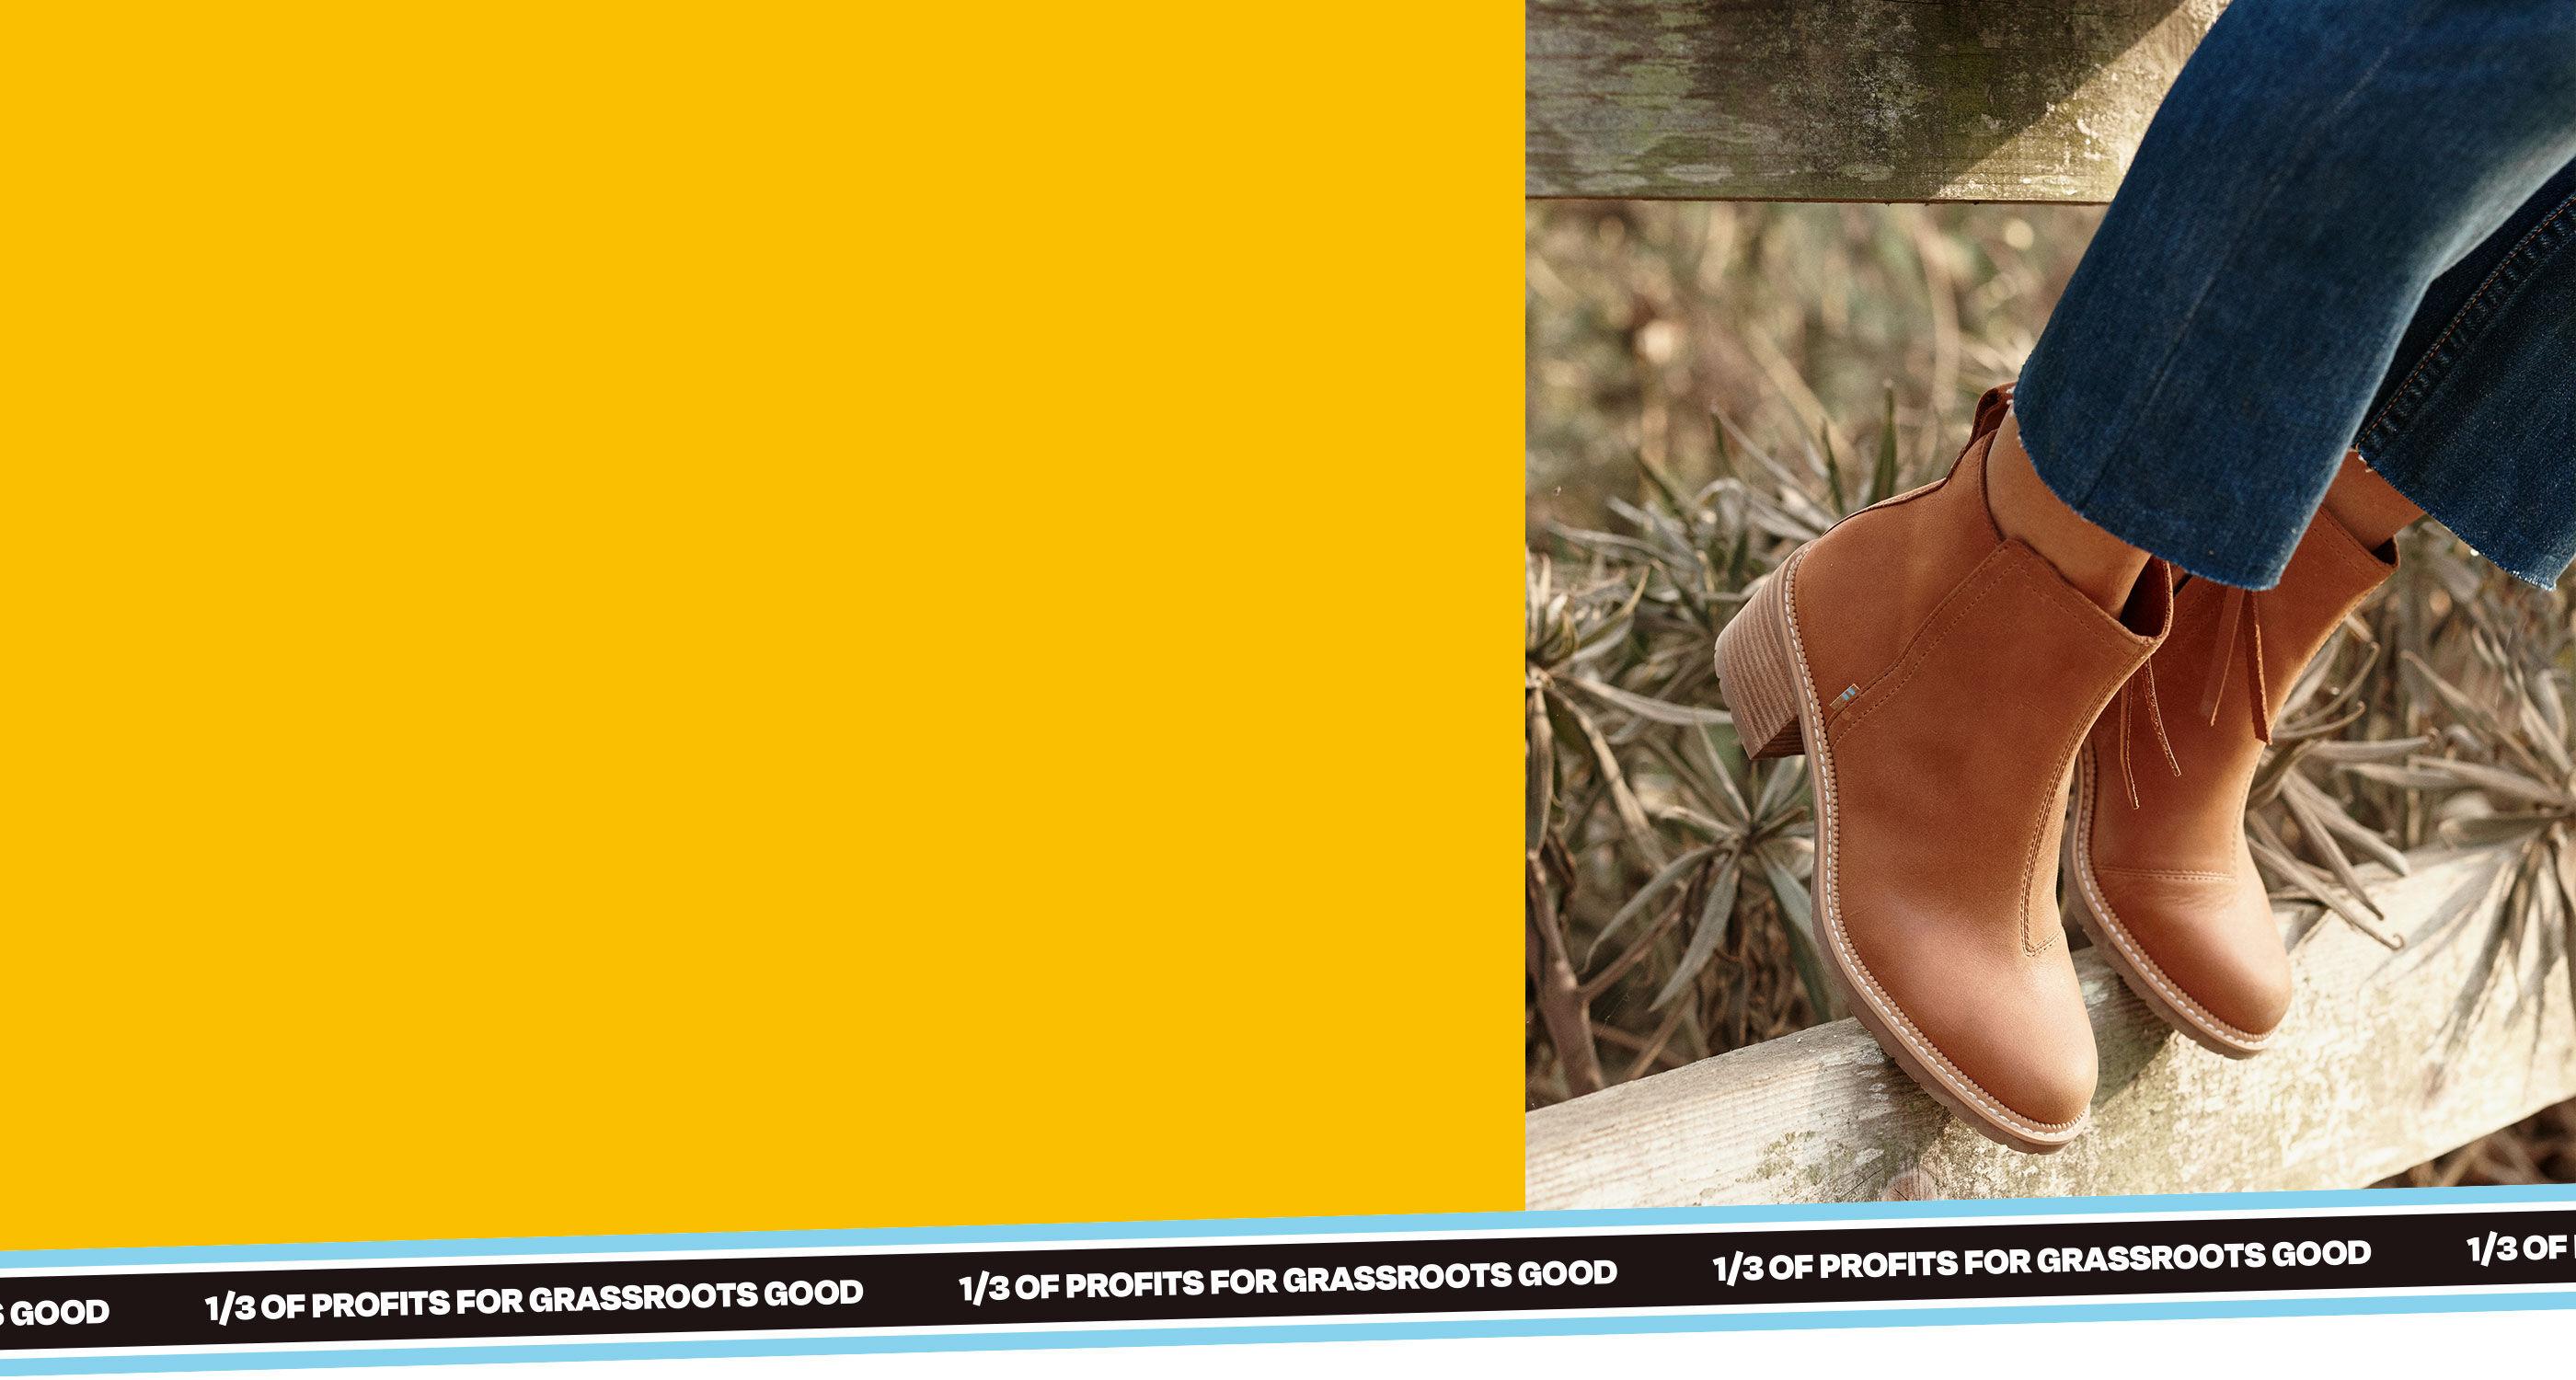 Women's Marina Boot in tan shown.